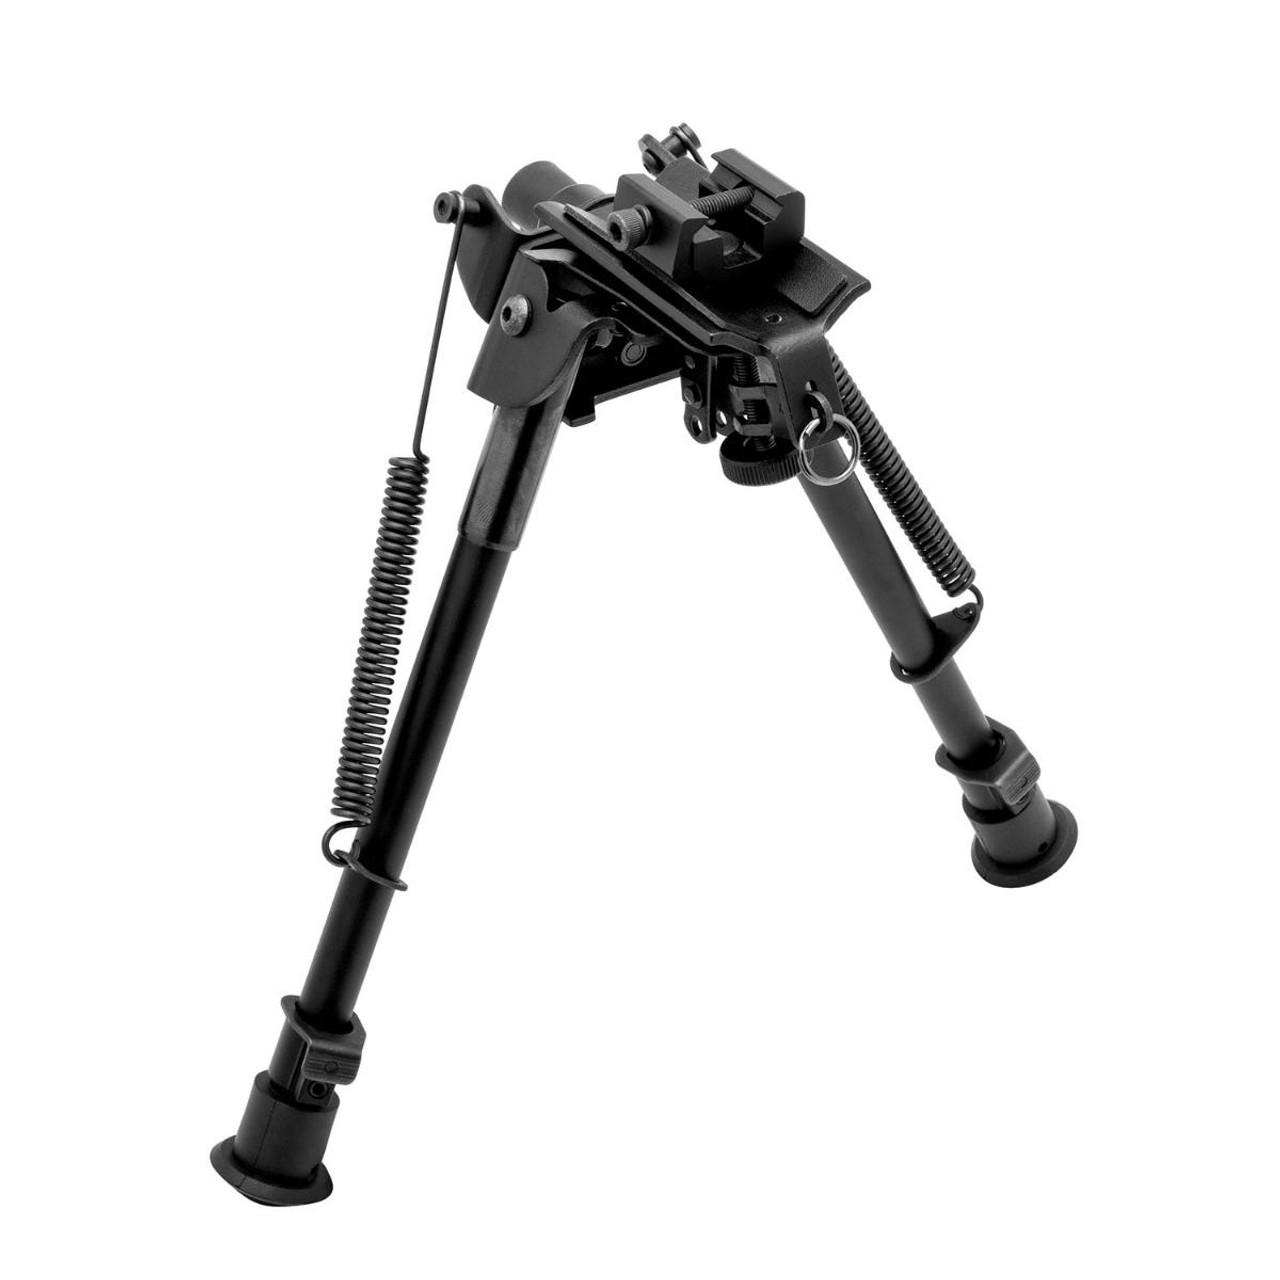 TAC•POD™ Adjustable Folding Bipod